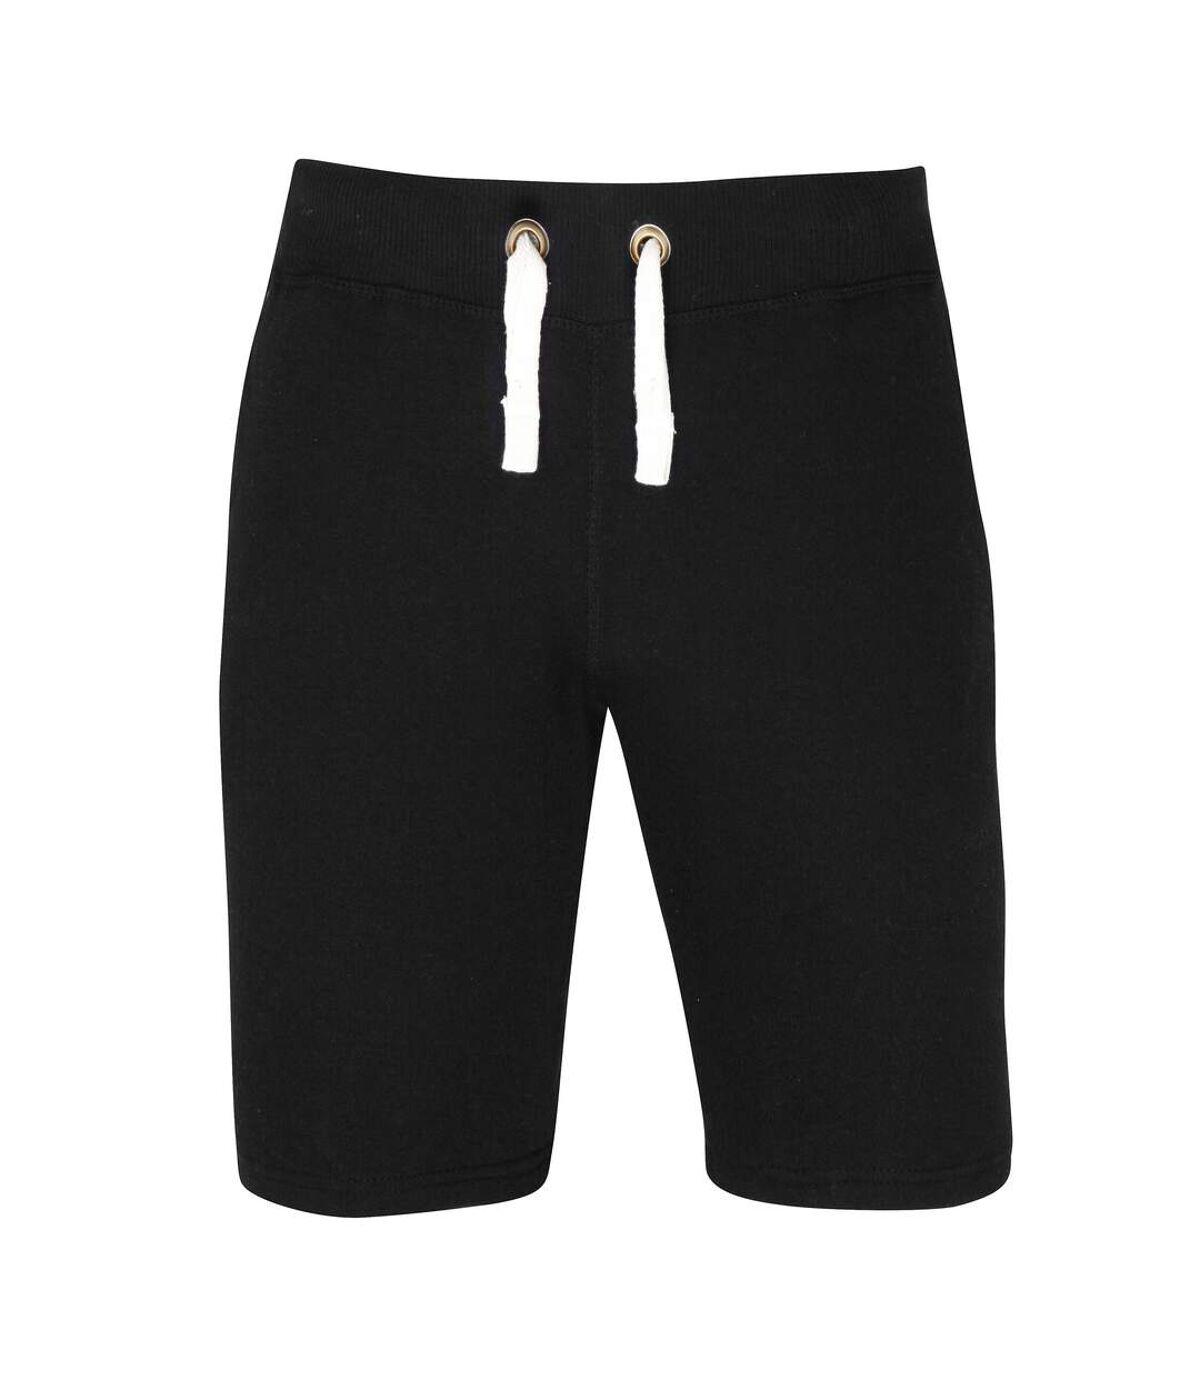 AWDis Hoods Plain Heavyweight Campus Shorts (Jet Black) - UTRW2549